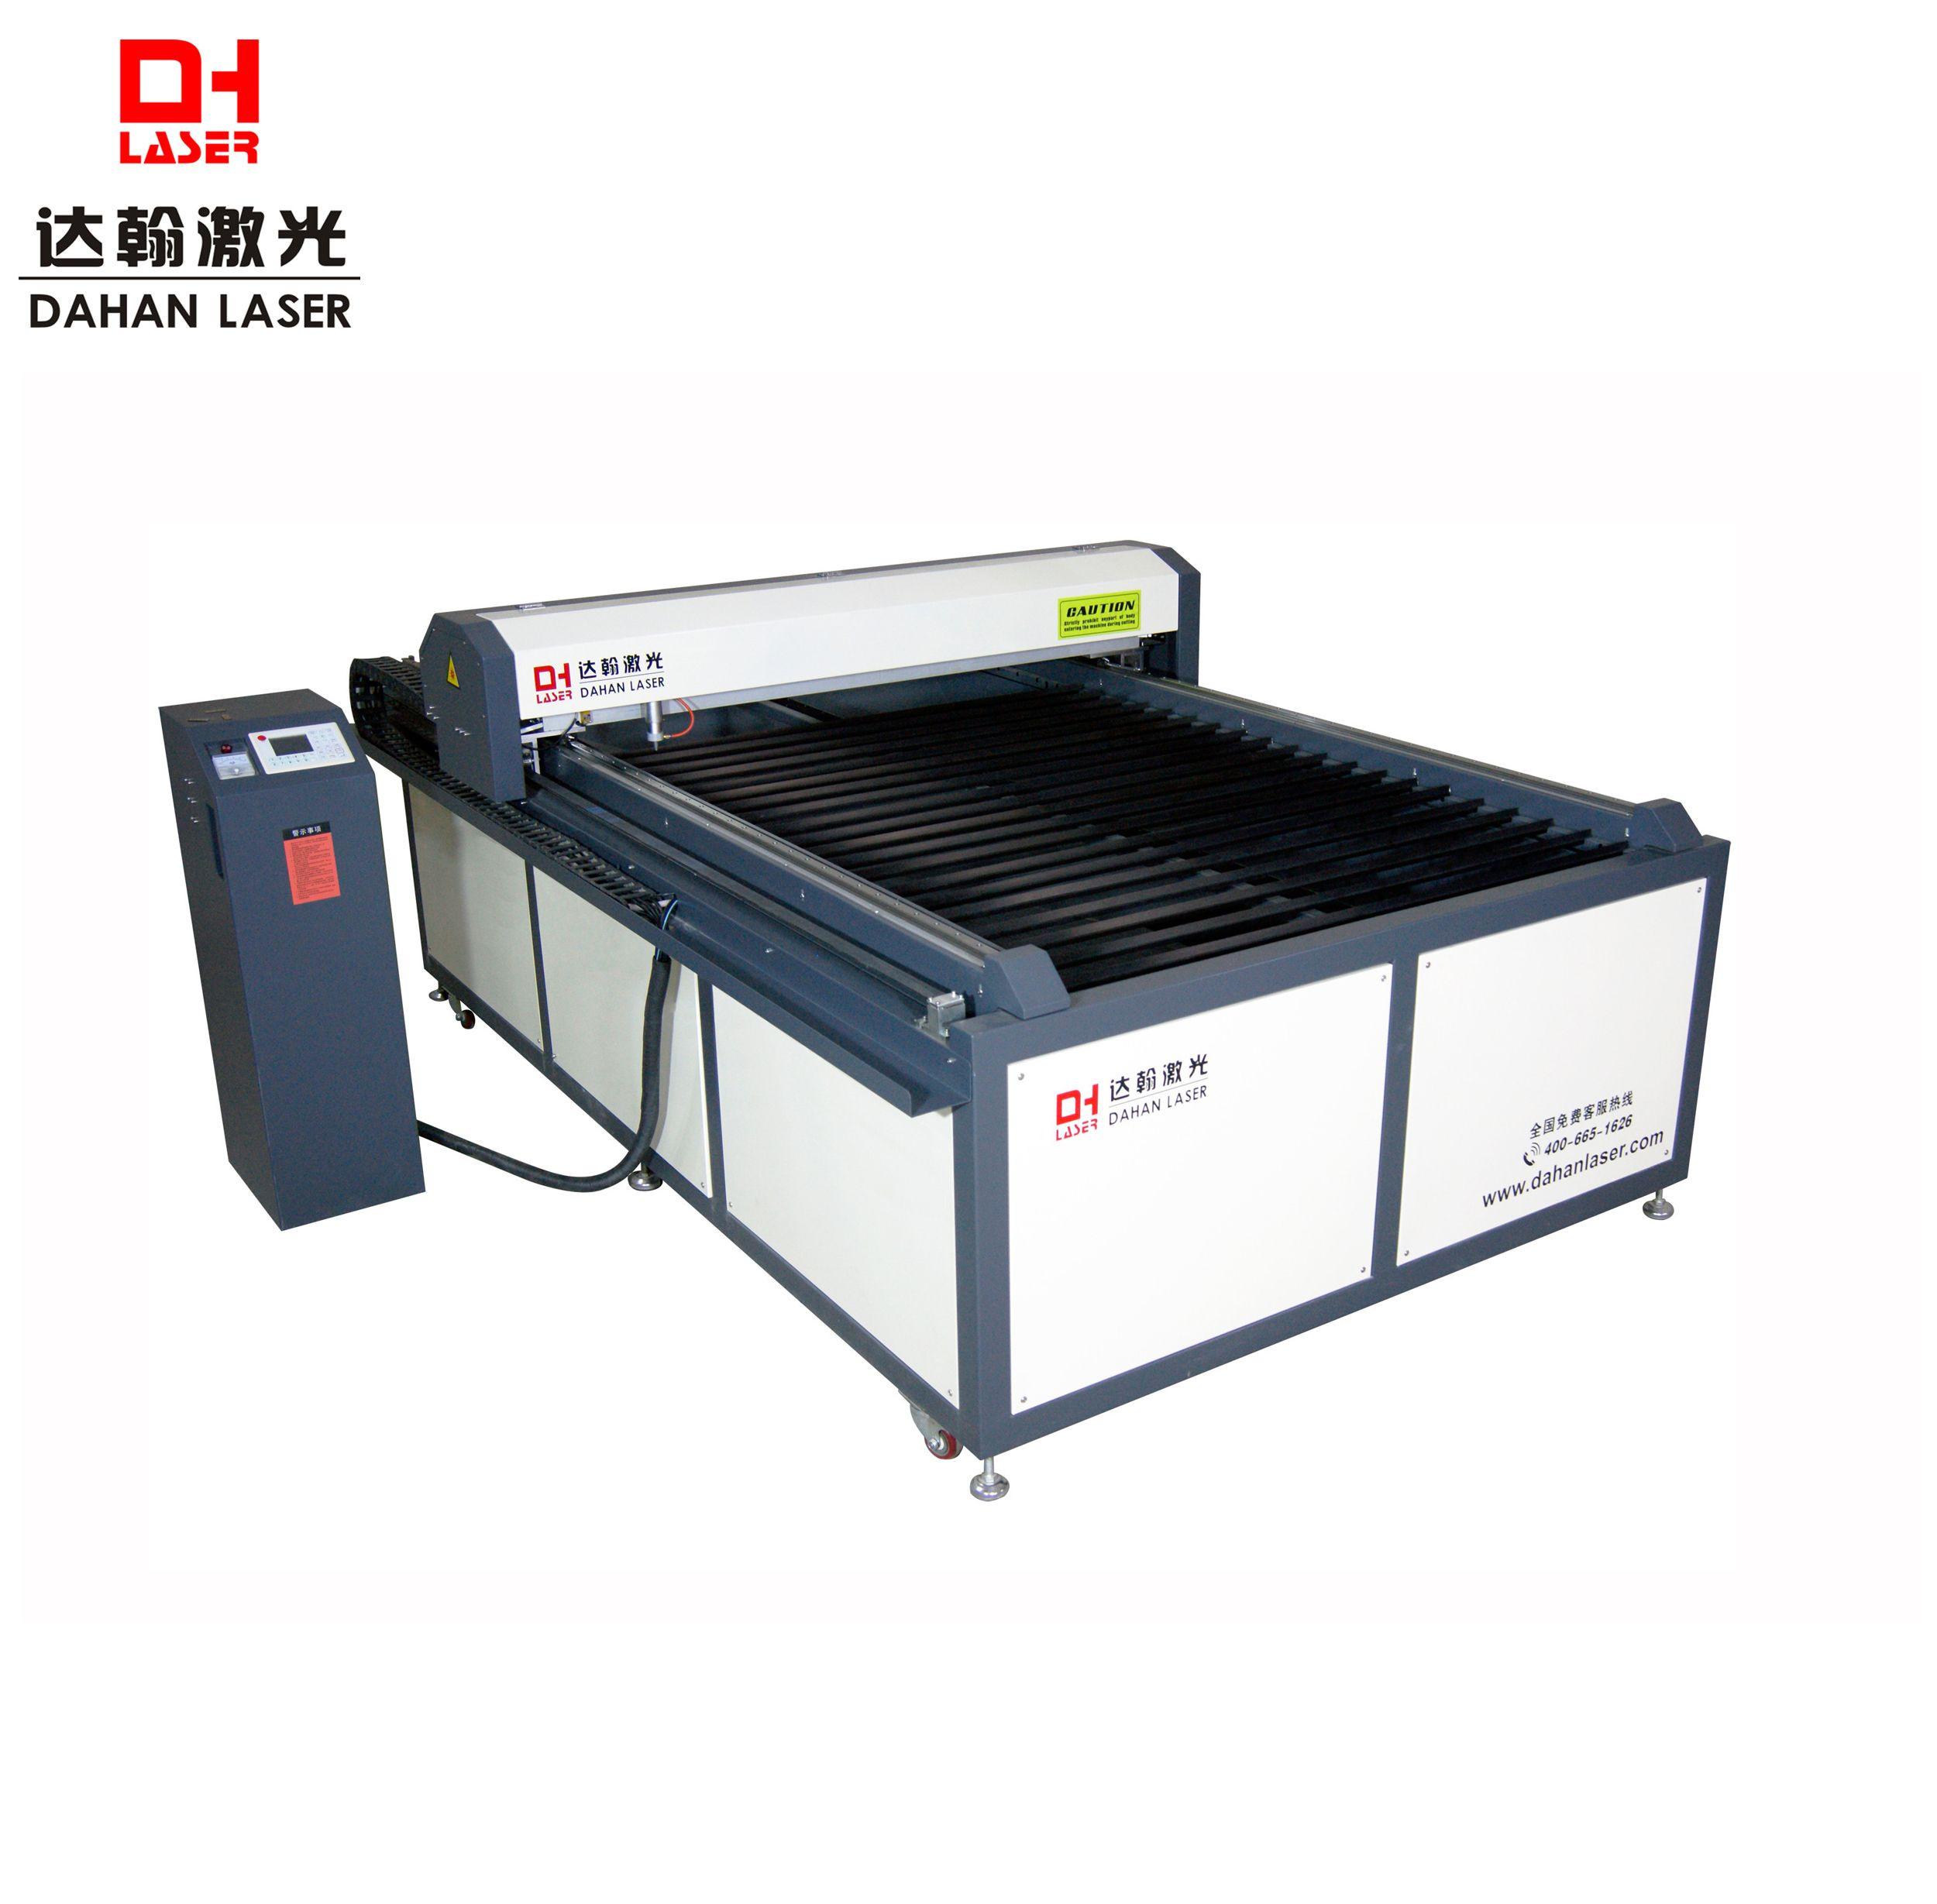 Large-size laser cutting machine